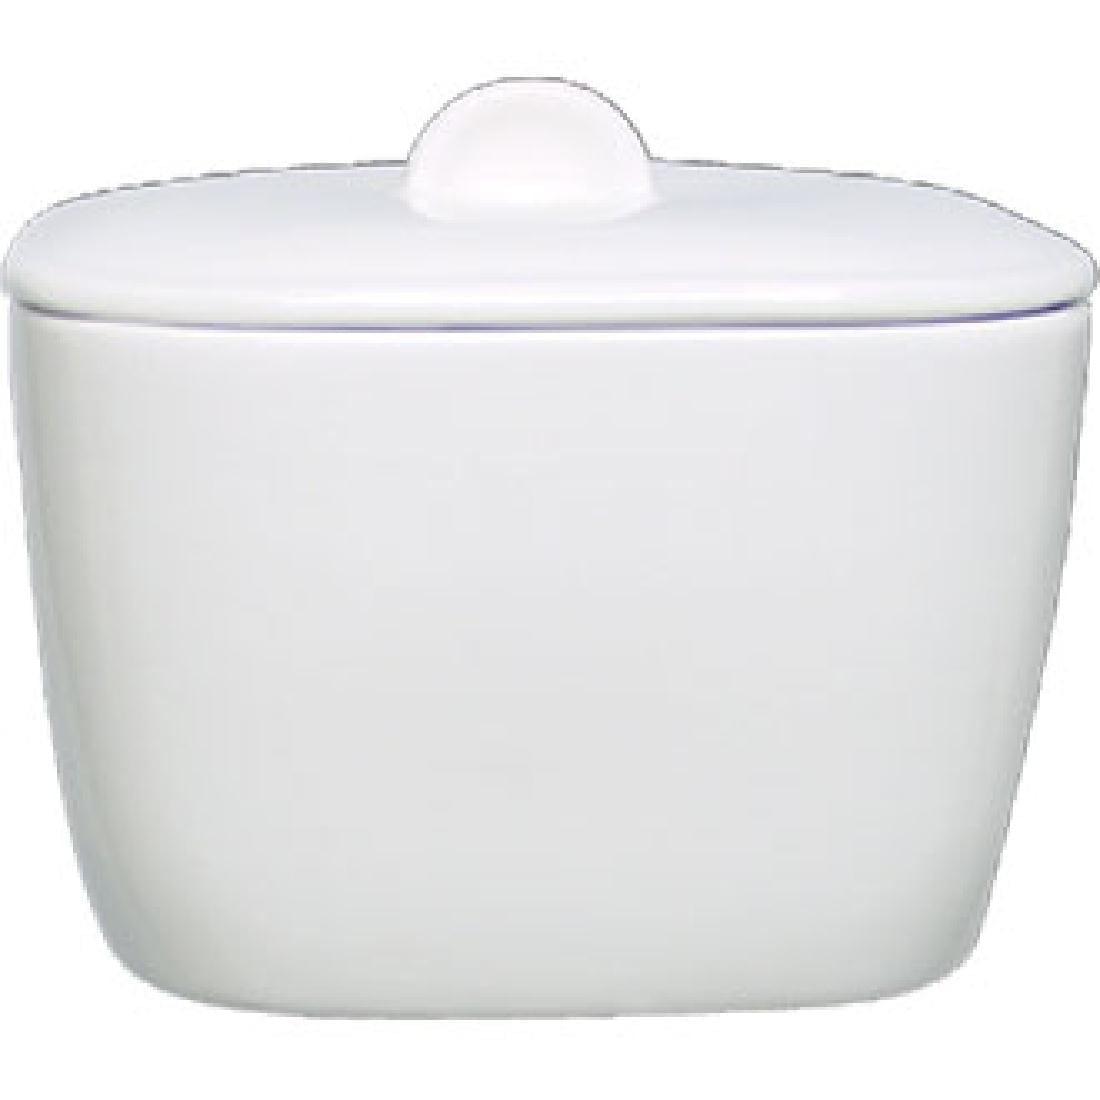 Alchemy White Square Bowl Covered (Box 6) (Direct)-0